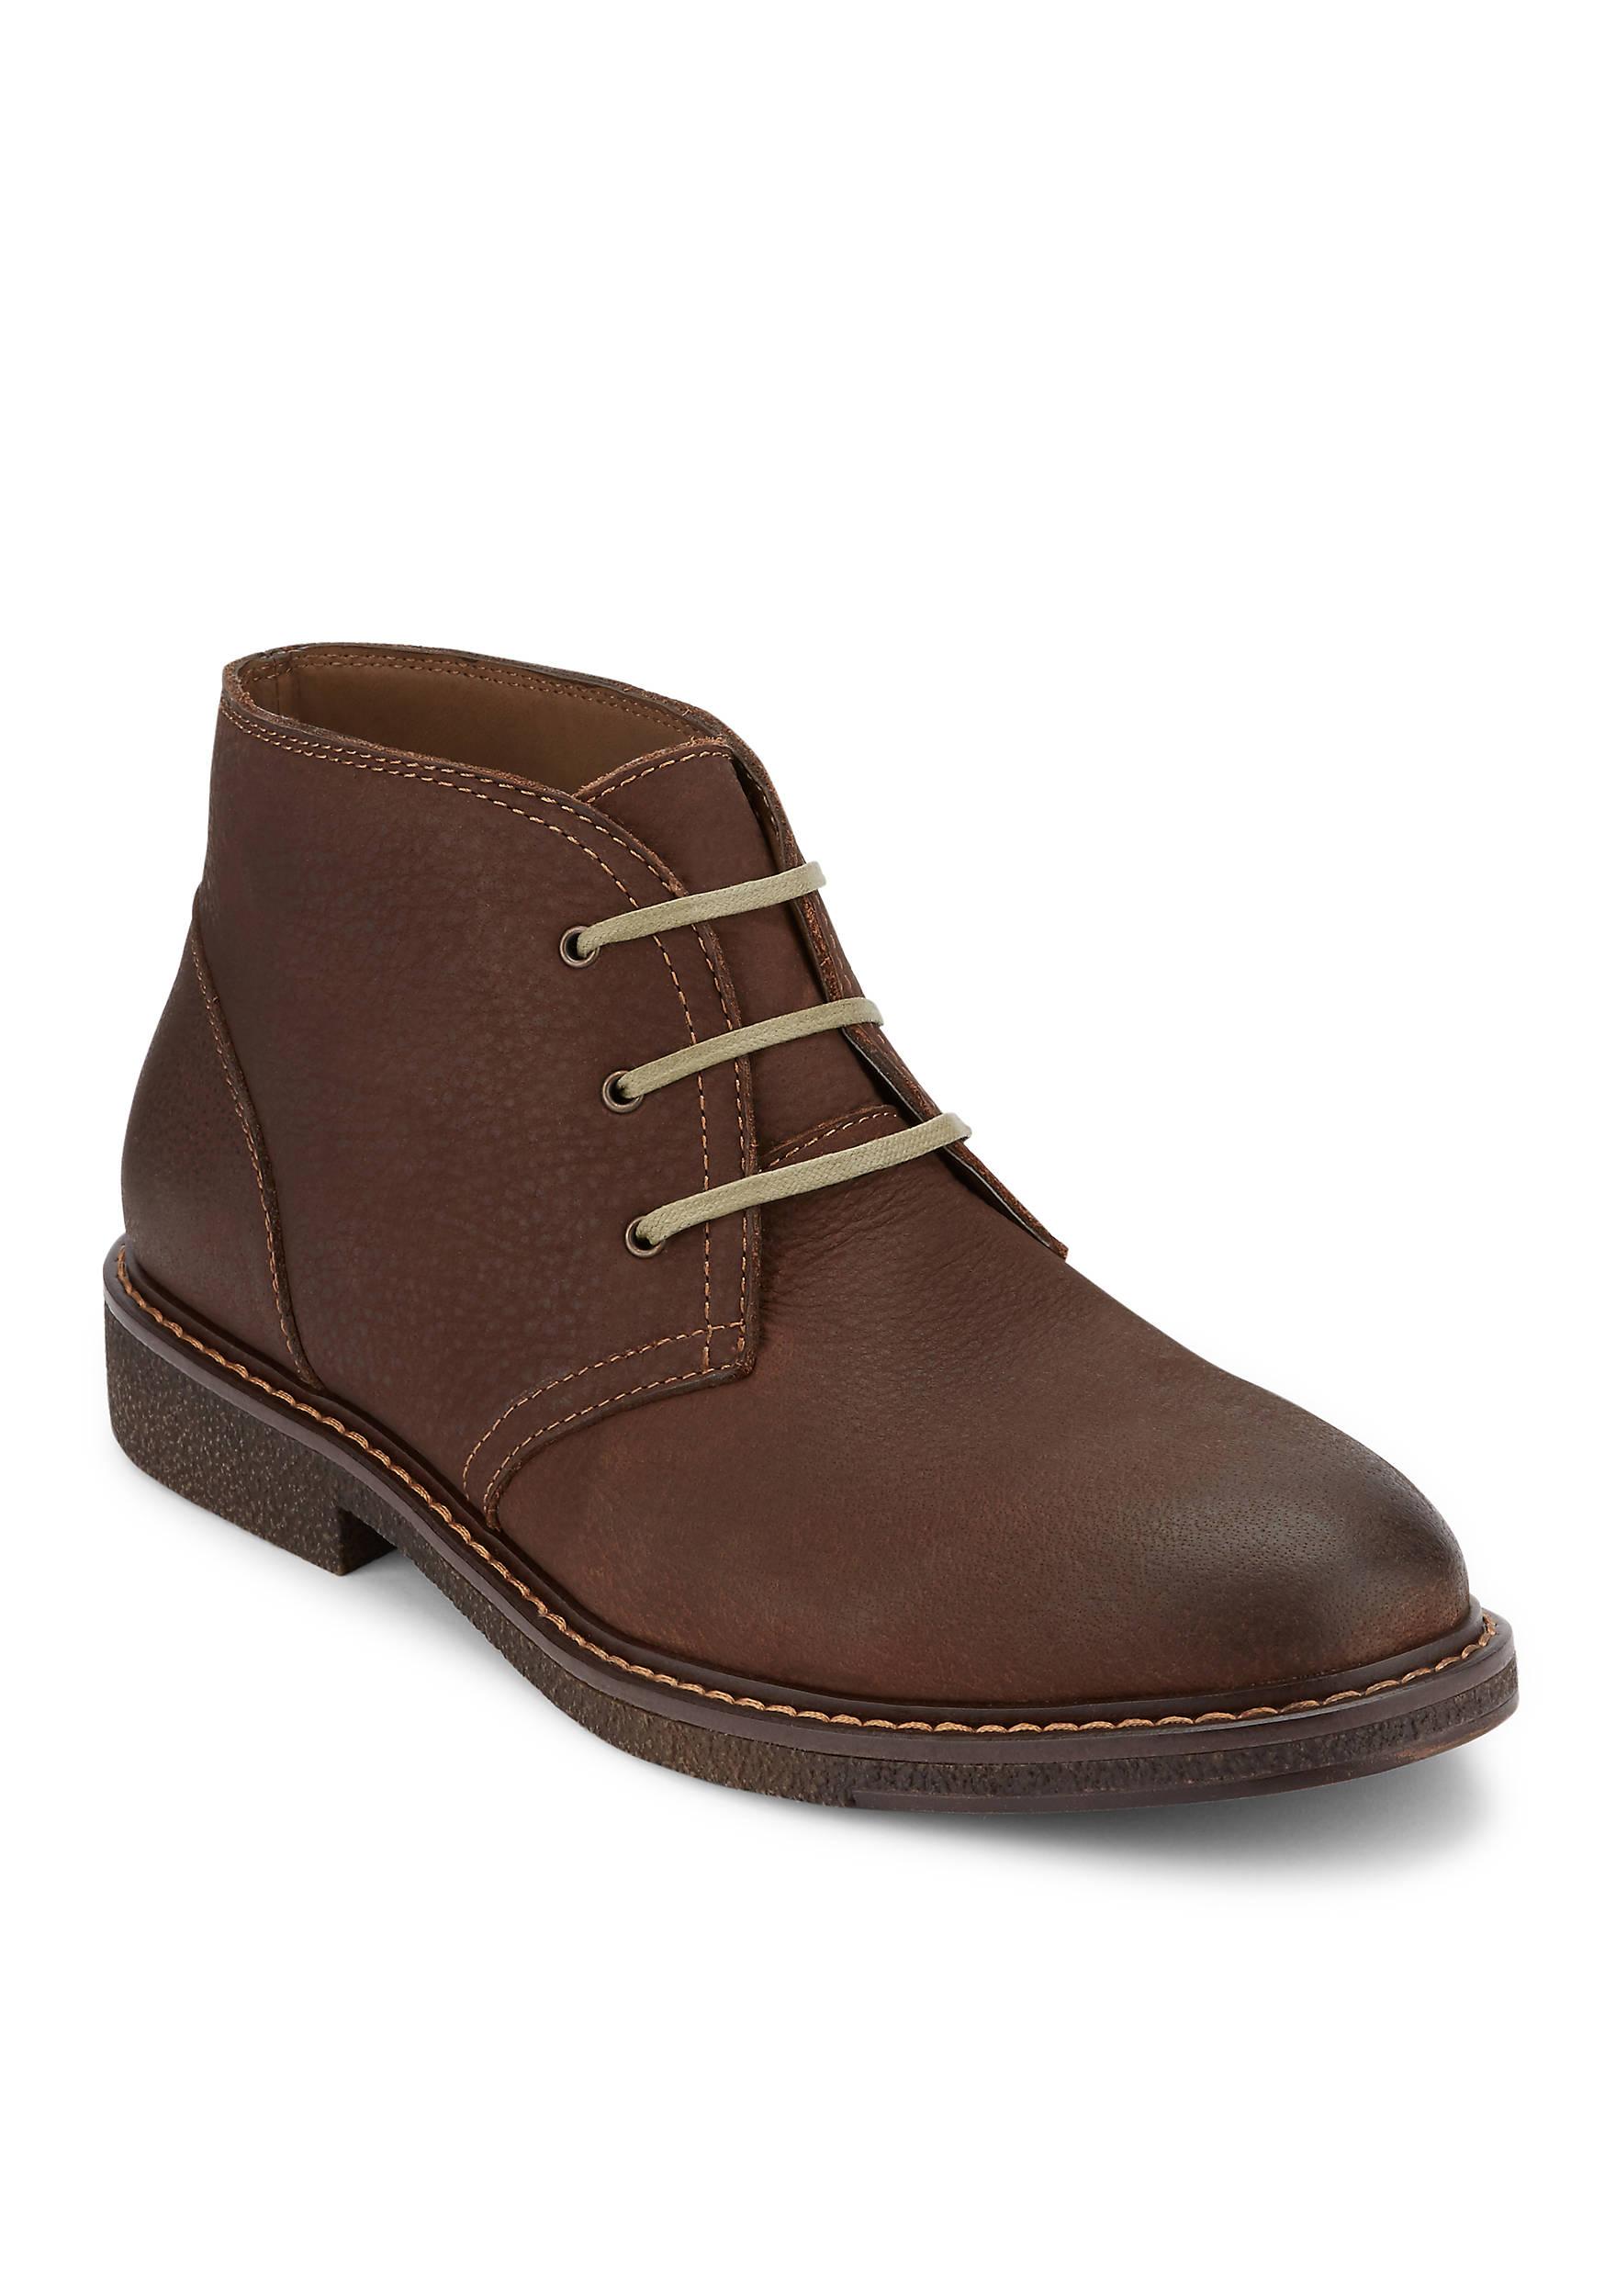 Stevens Chukka Shoes